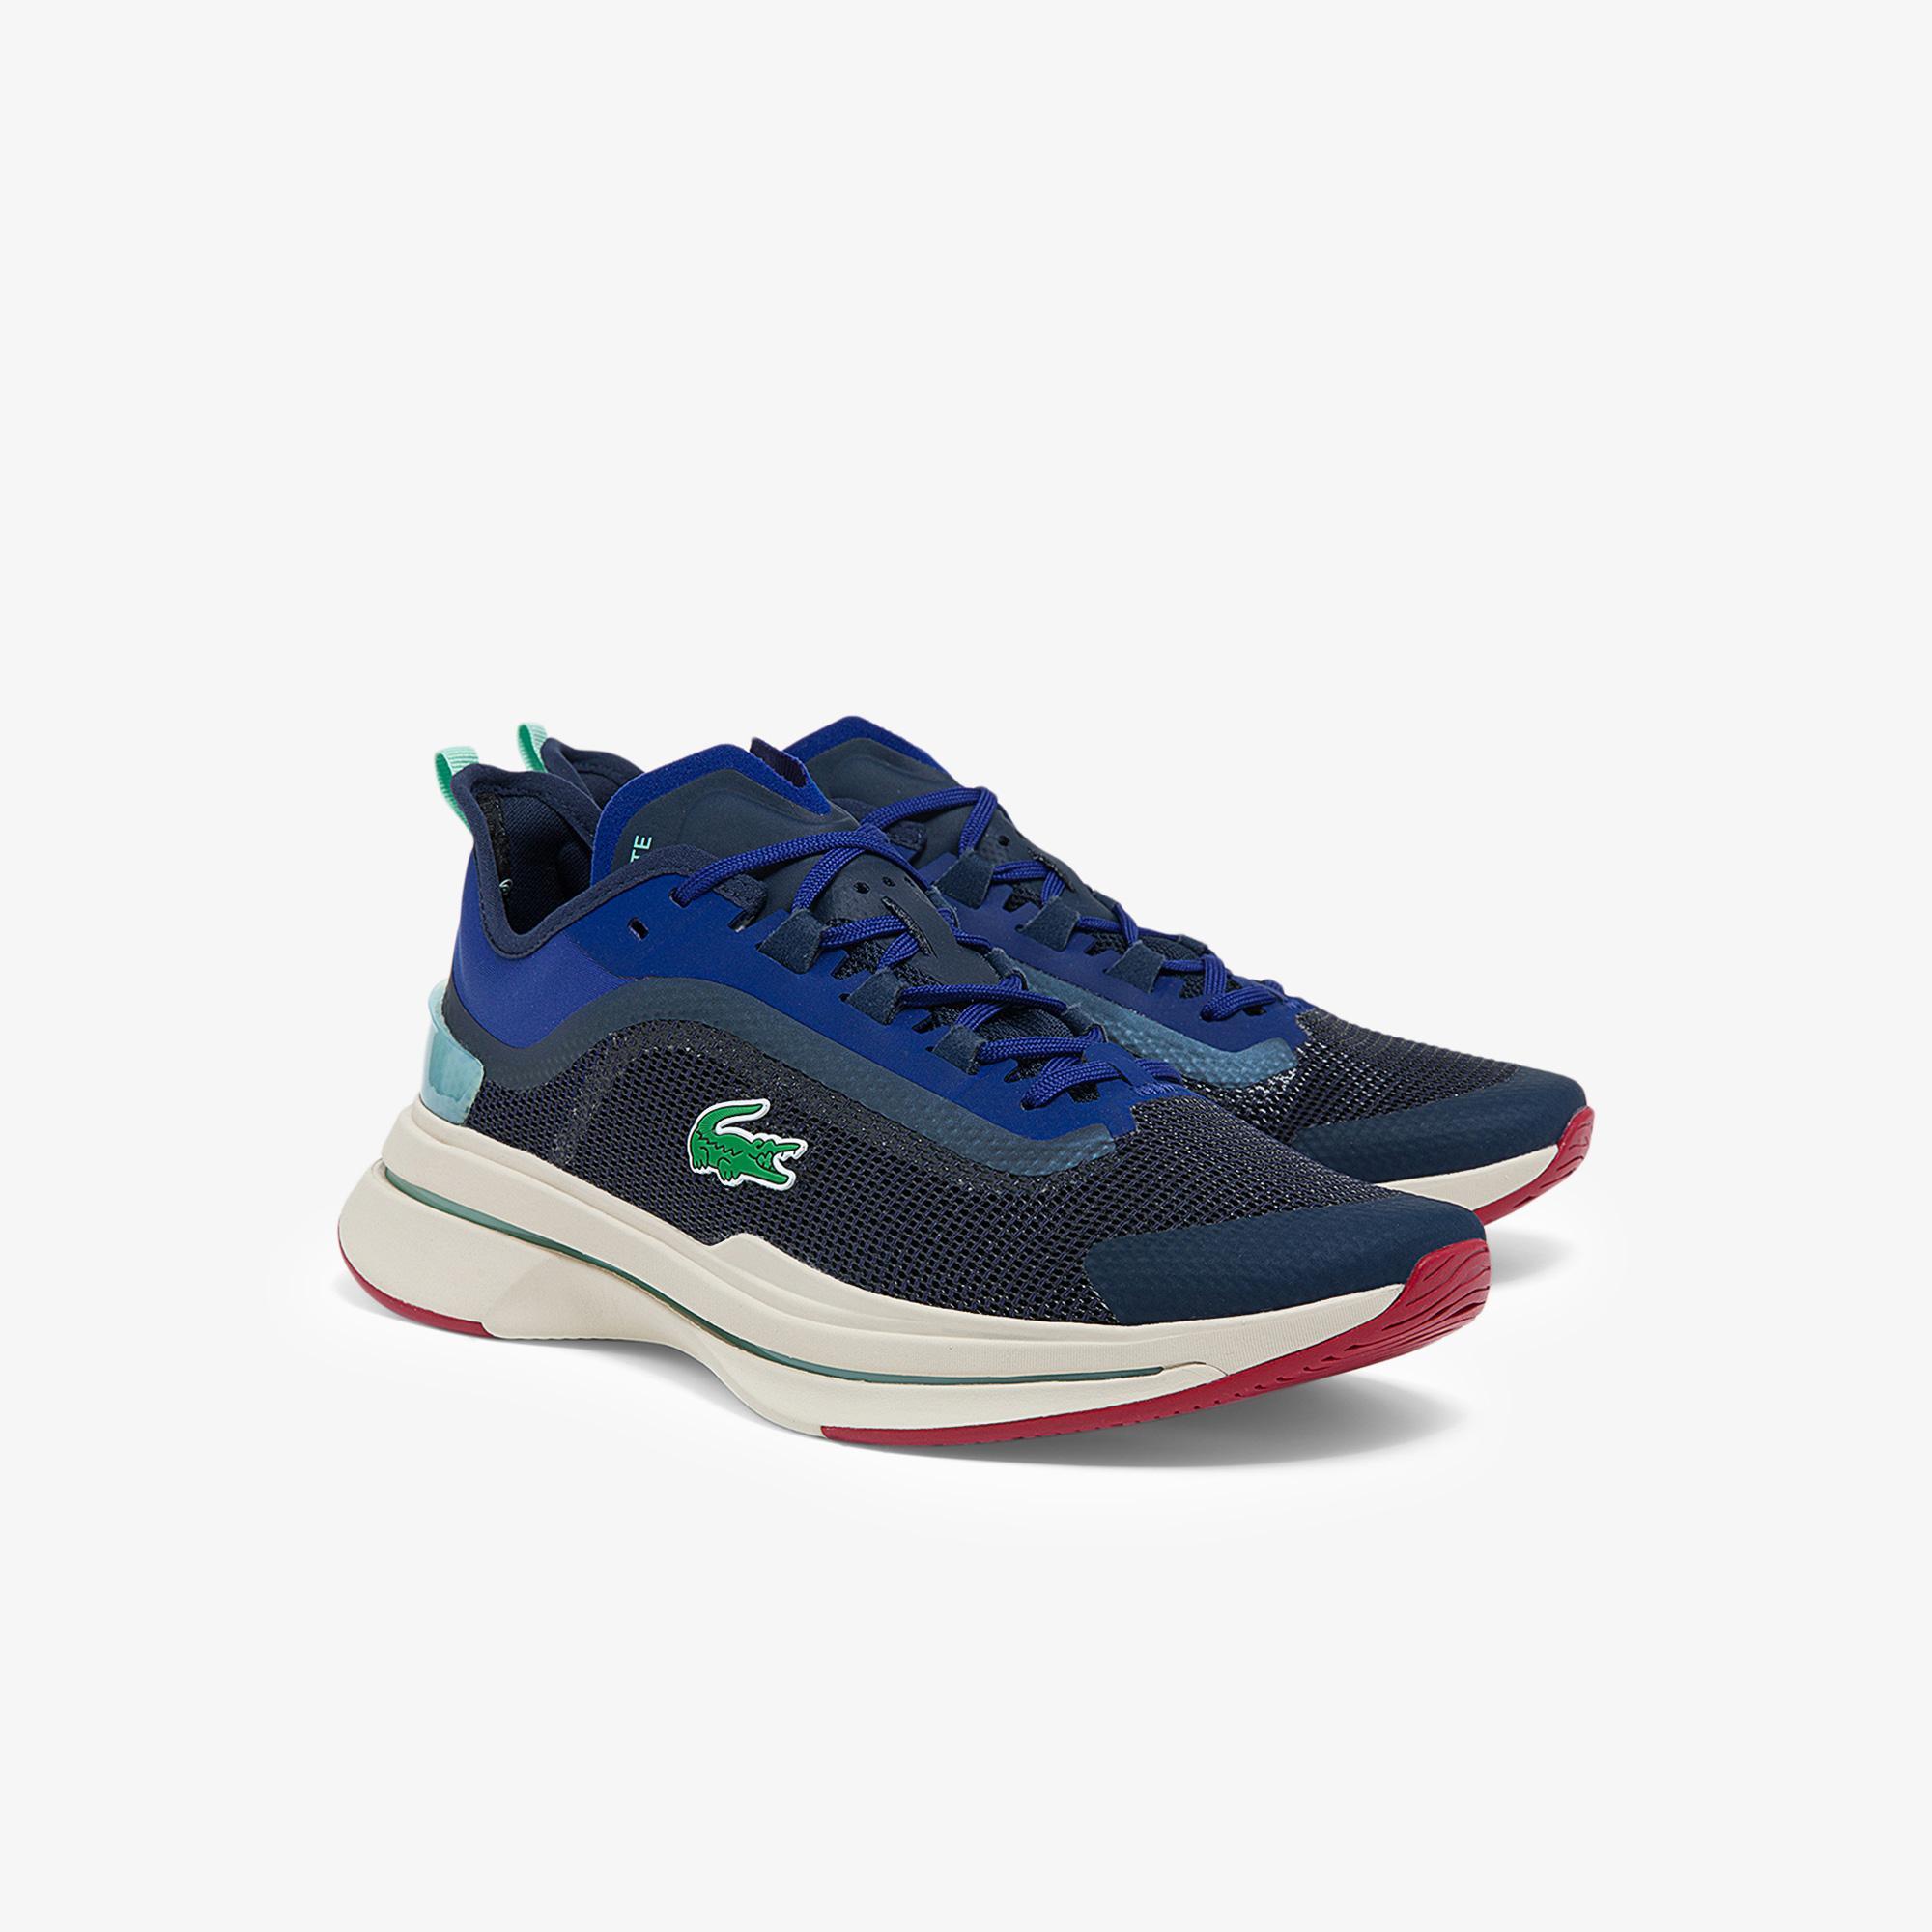 Lacoste Run Spin Ultra 0121 1 Sma Erkek Lacivert - Mavi Sneaker